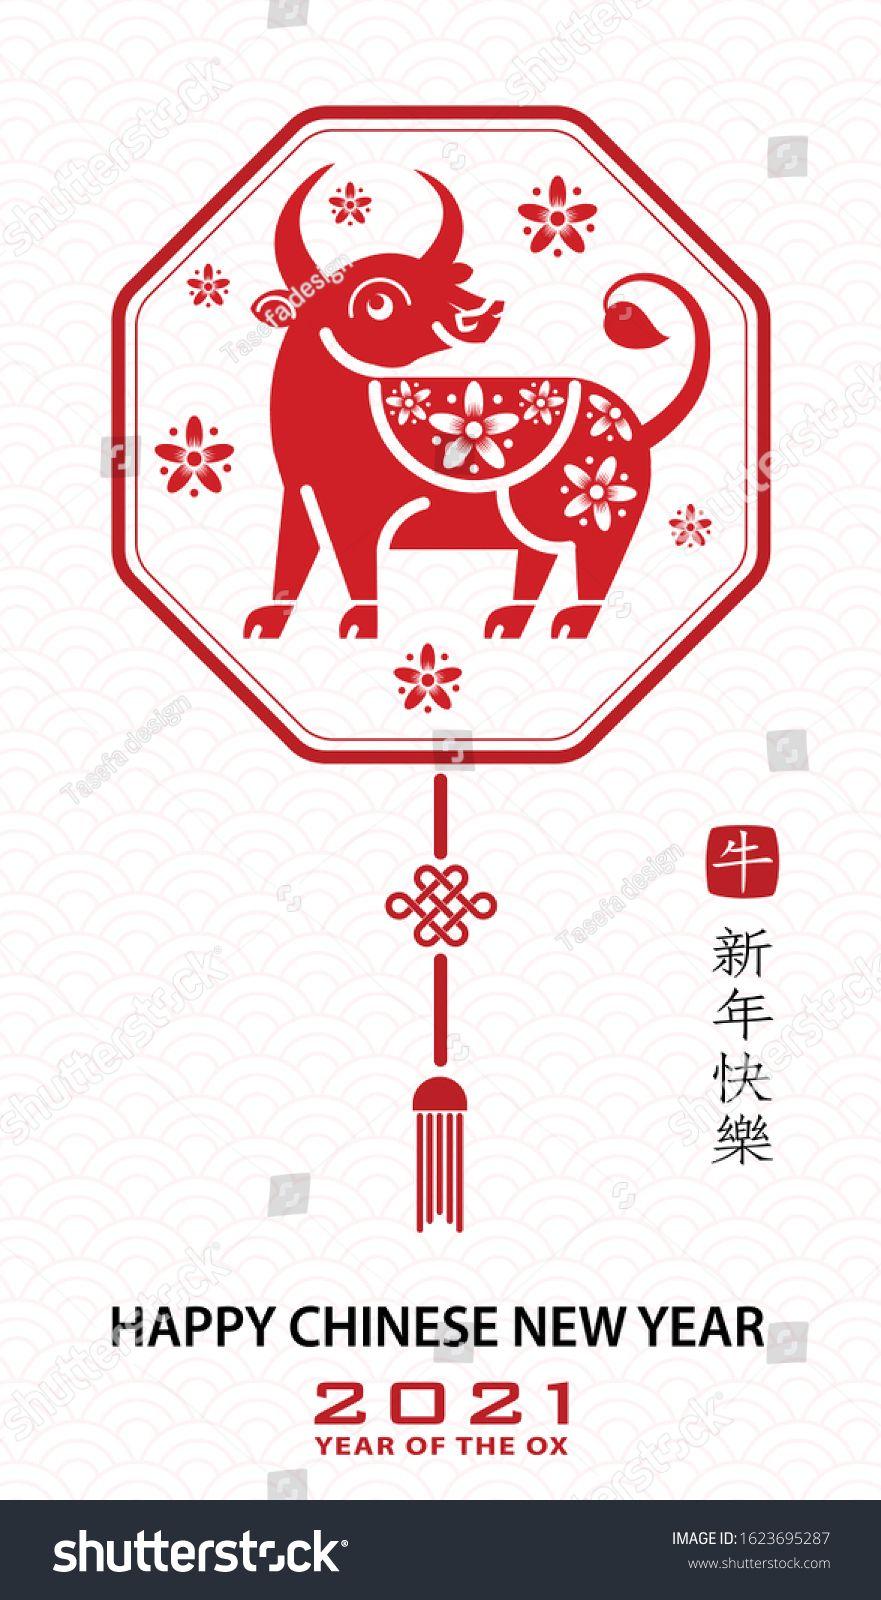 Image vectorielle de stock de Happy Chinese New Year 2021